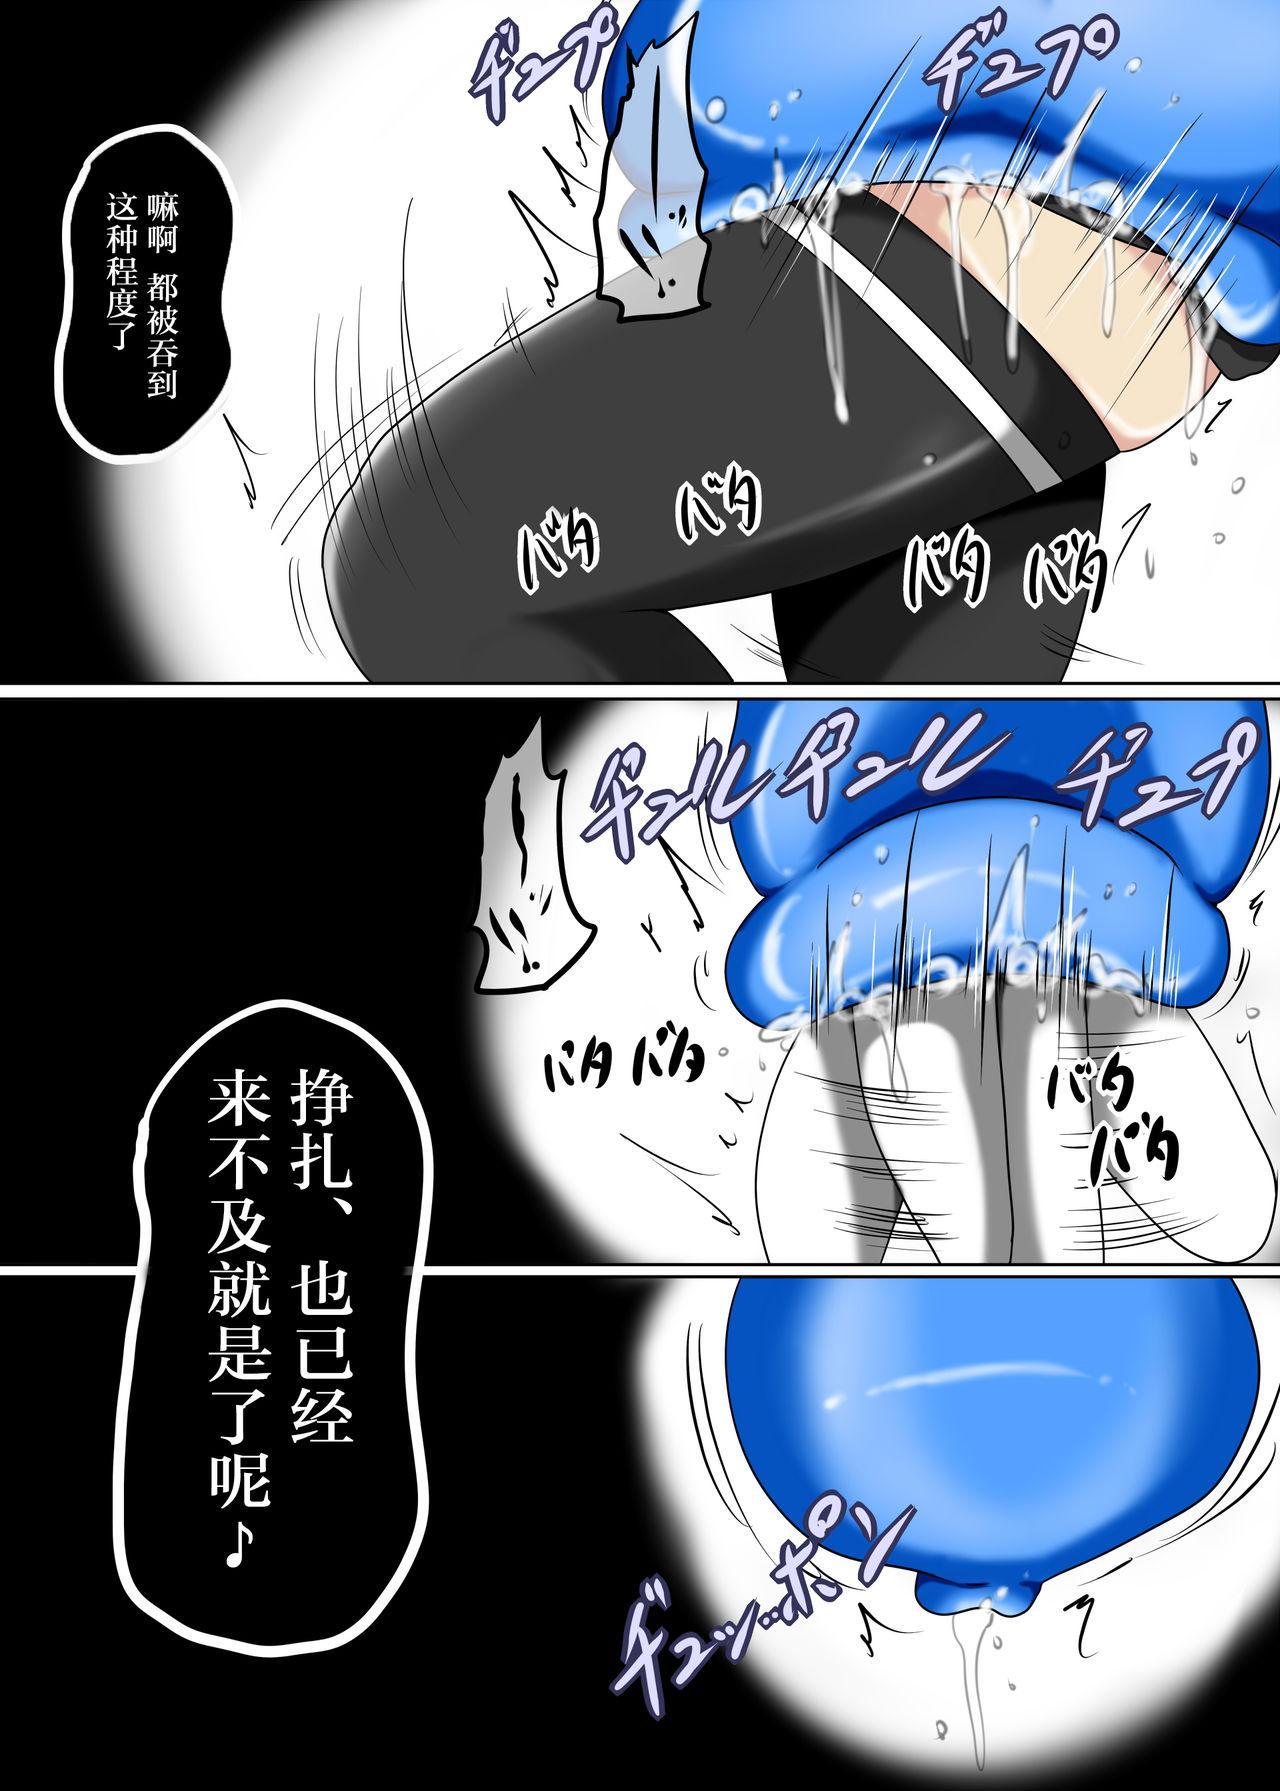 Senkan Re-kyuu no Kindaika Kaishuu 11